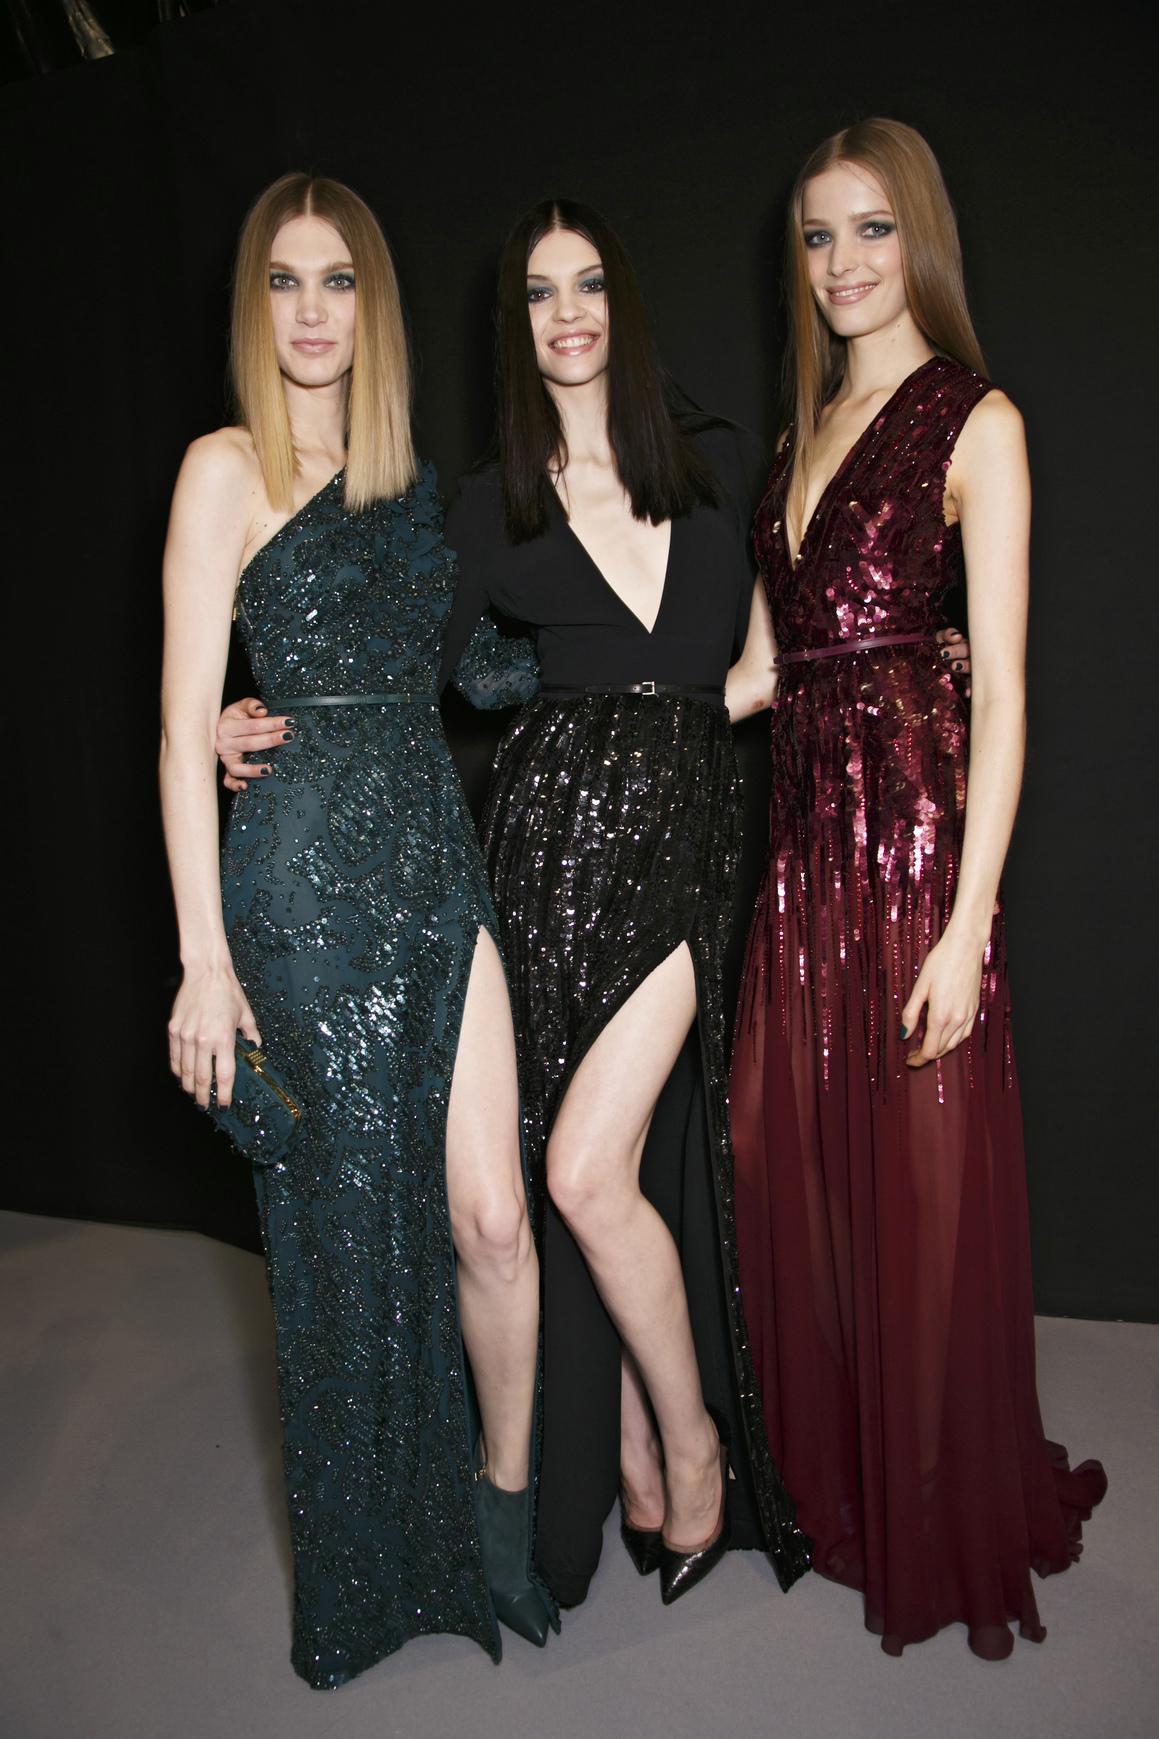 Długa suknia pasuje do każdej sylwetki